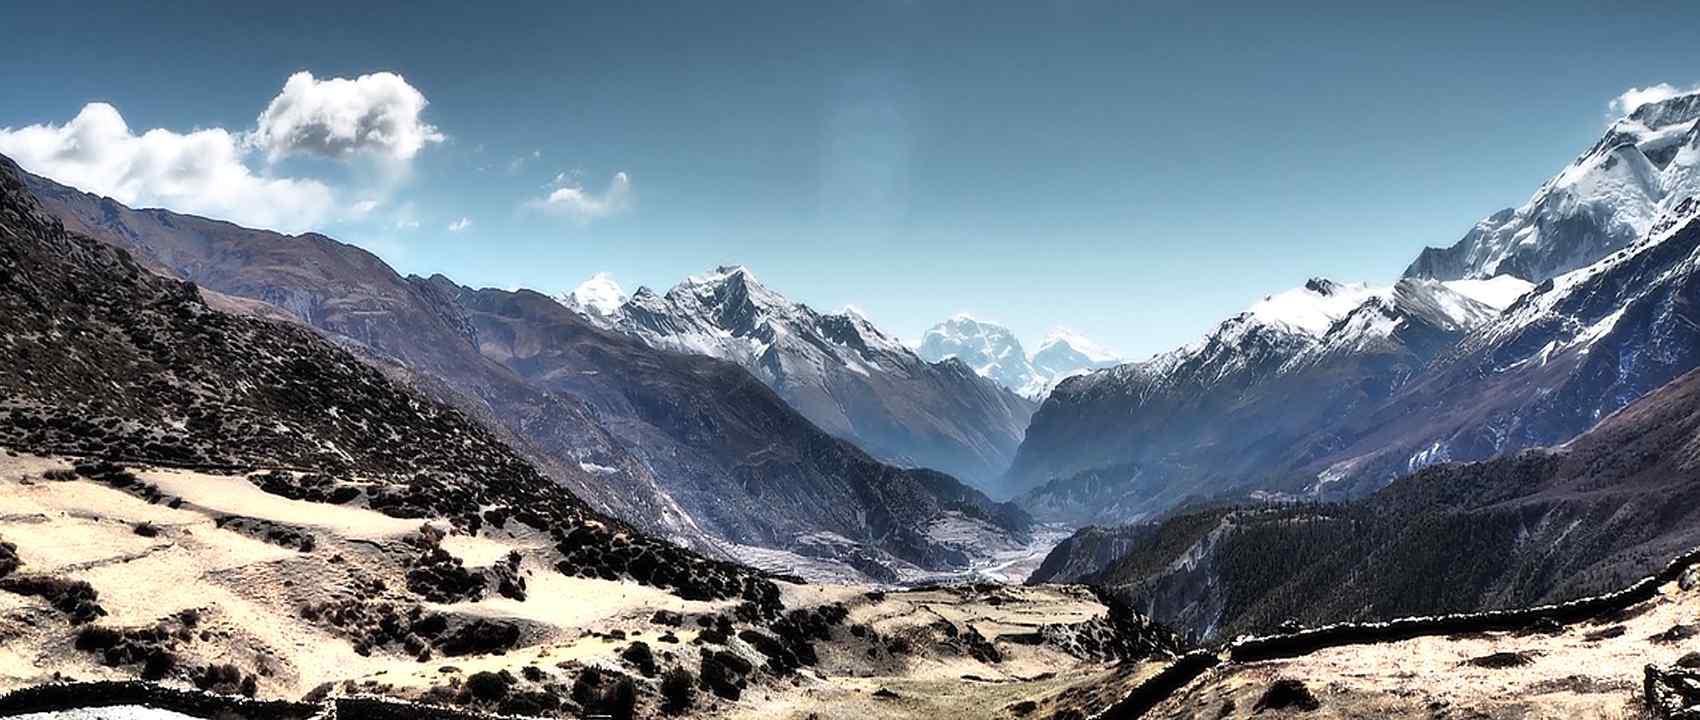 Nar Phu Trek with Annapurna Circuit In Nepal